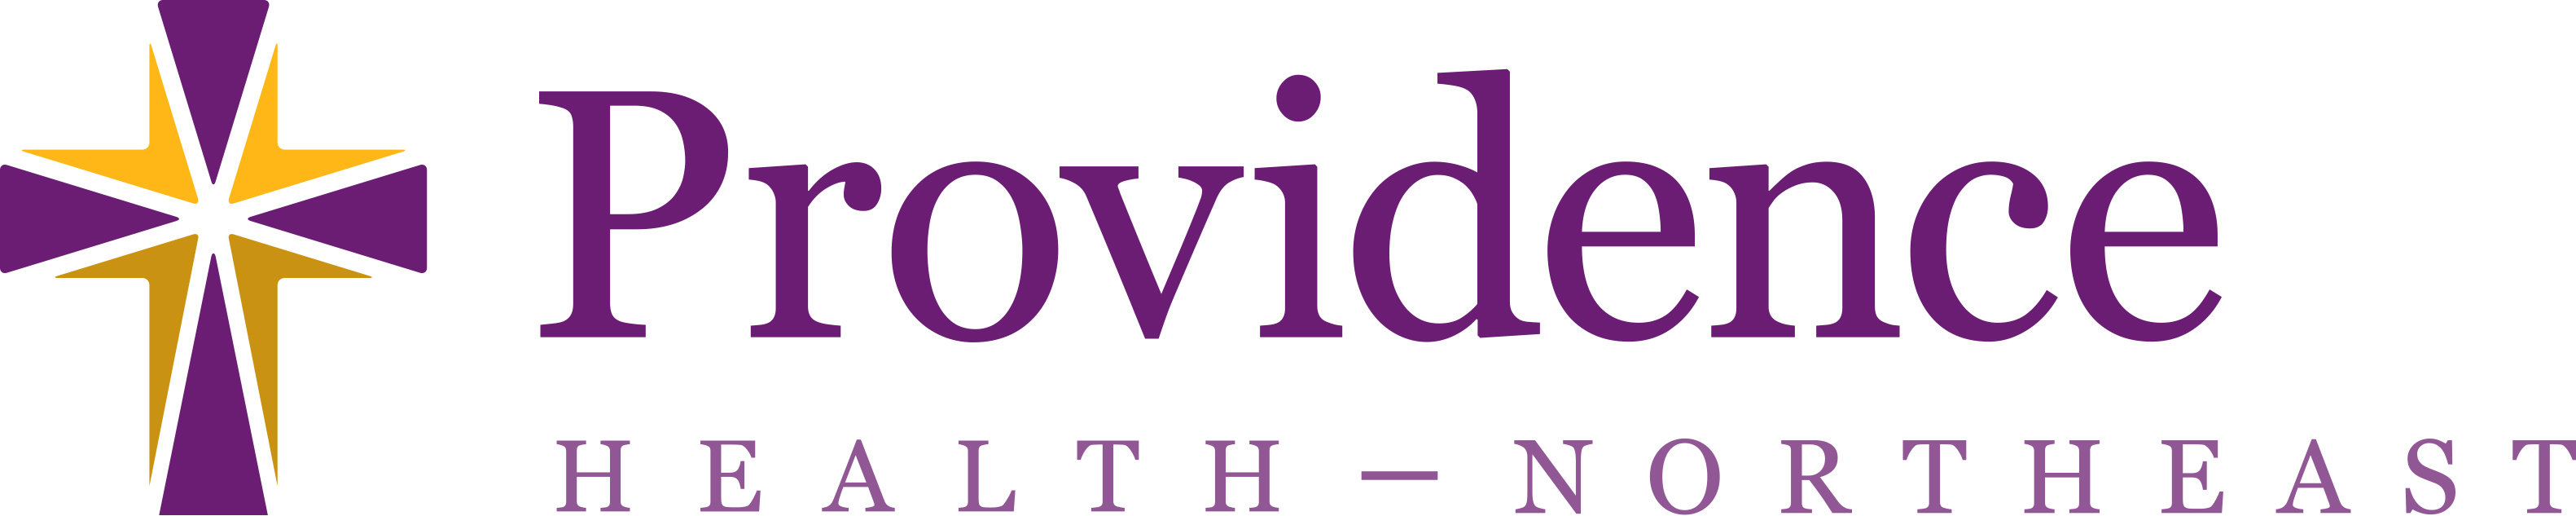 providence health northeast